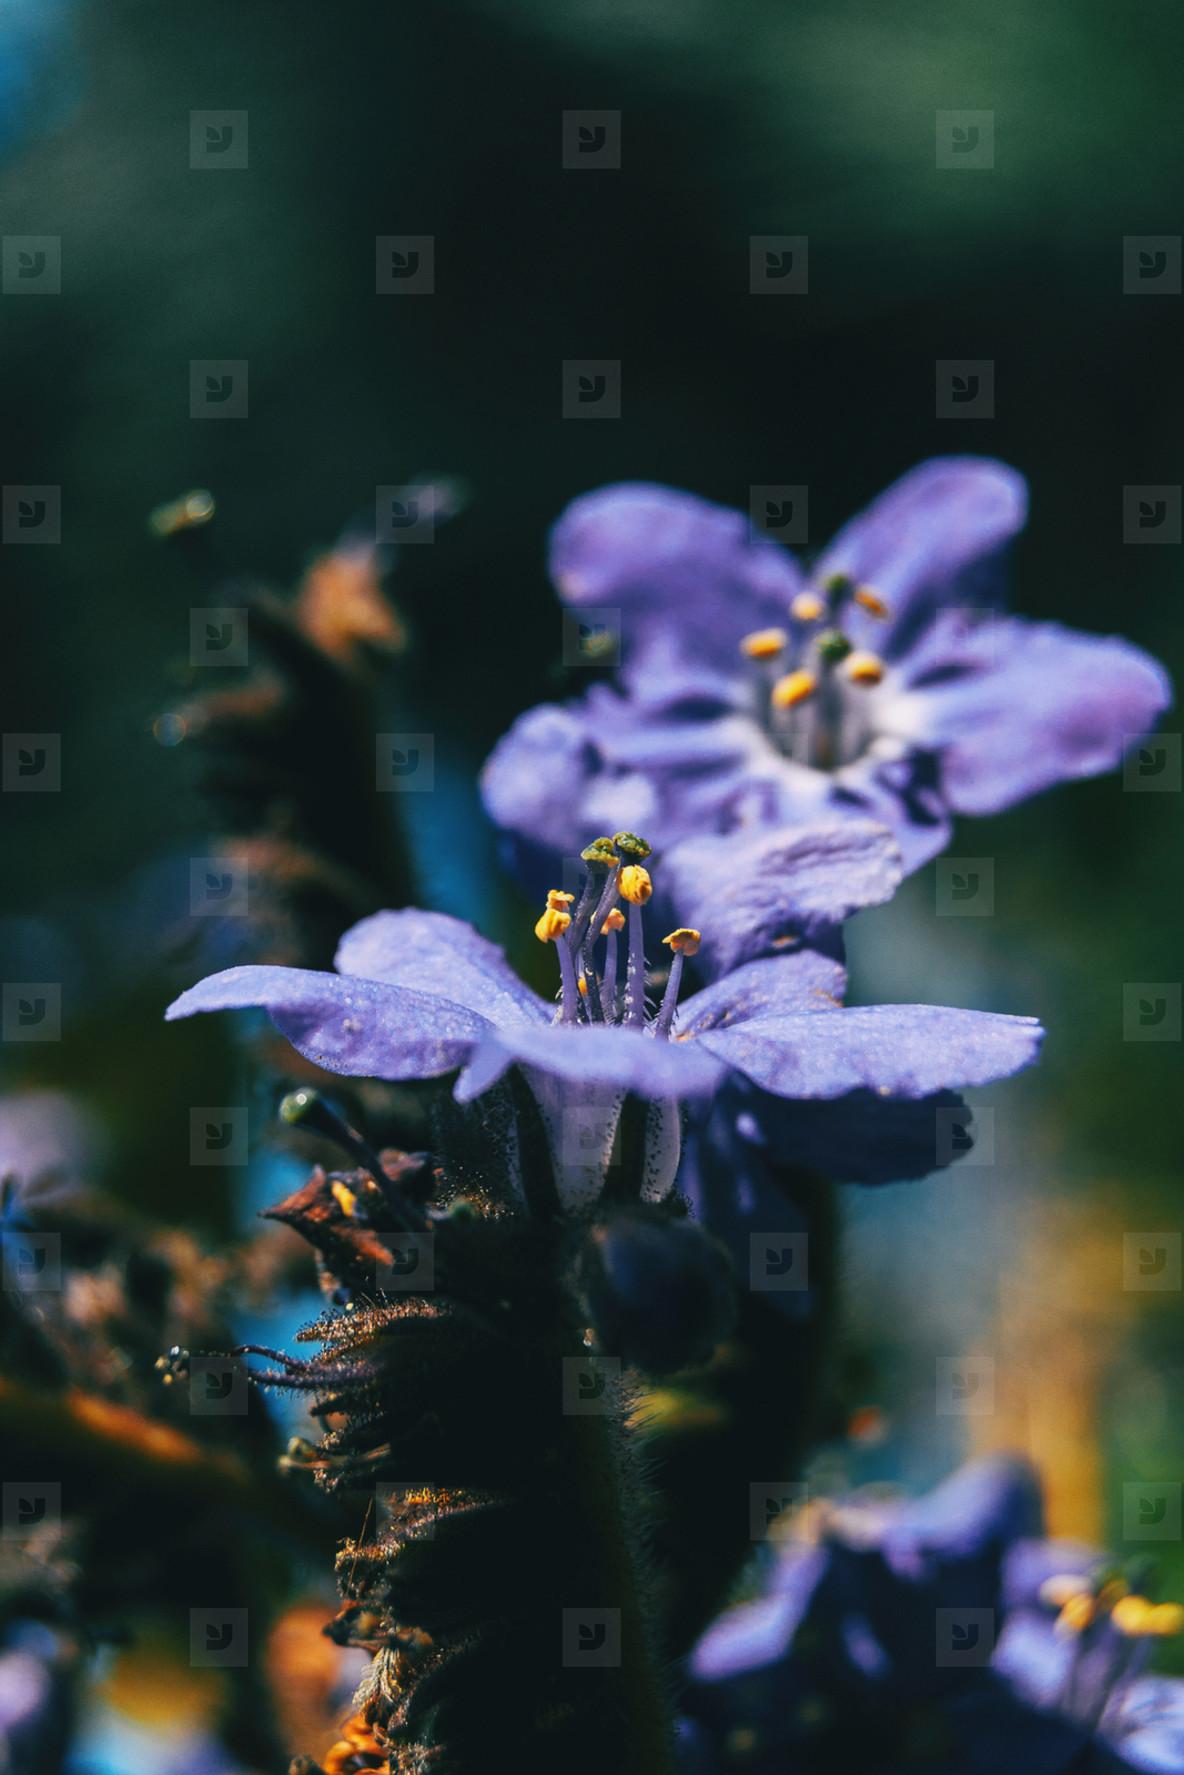 Close up of the erected stamens of a purple flower of polemonium caeruleum